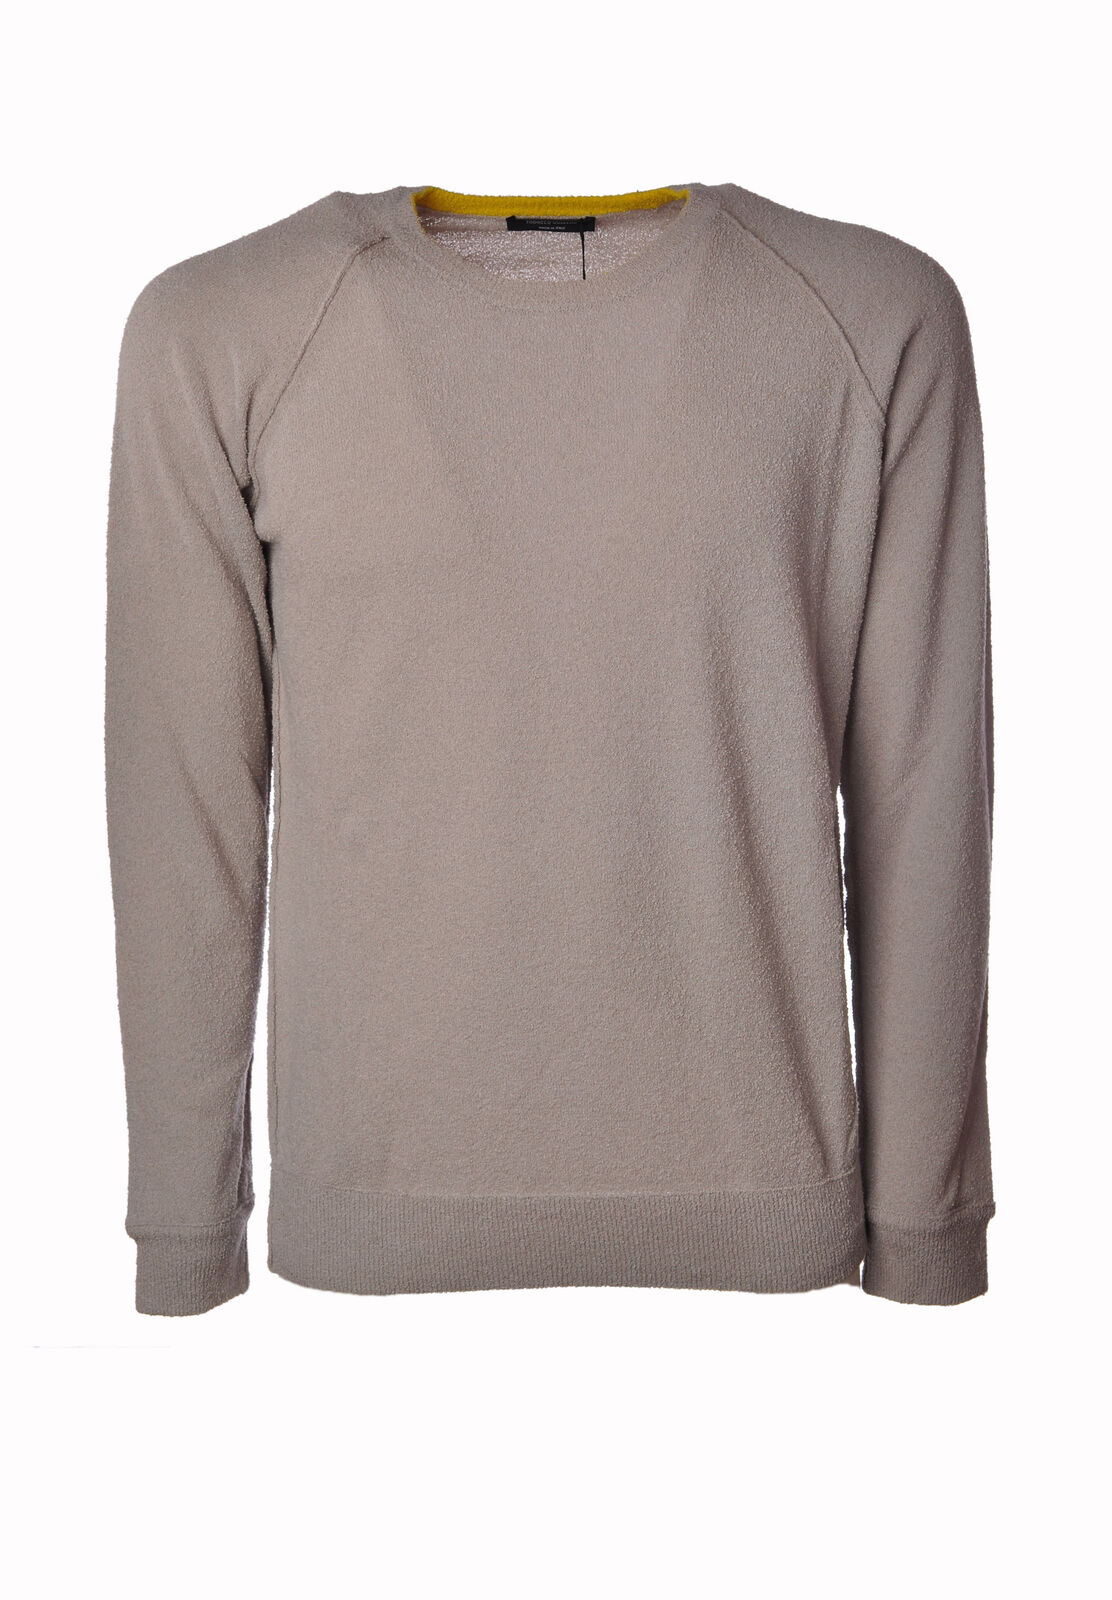 Roberto Collina  -  Sweaters - Male - Beige - 3212615A183648